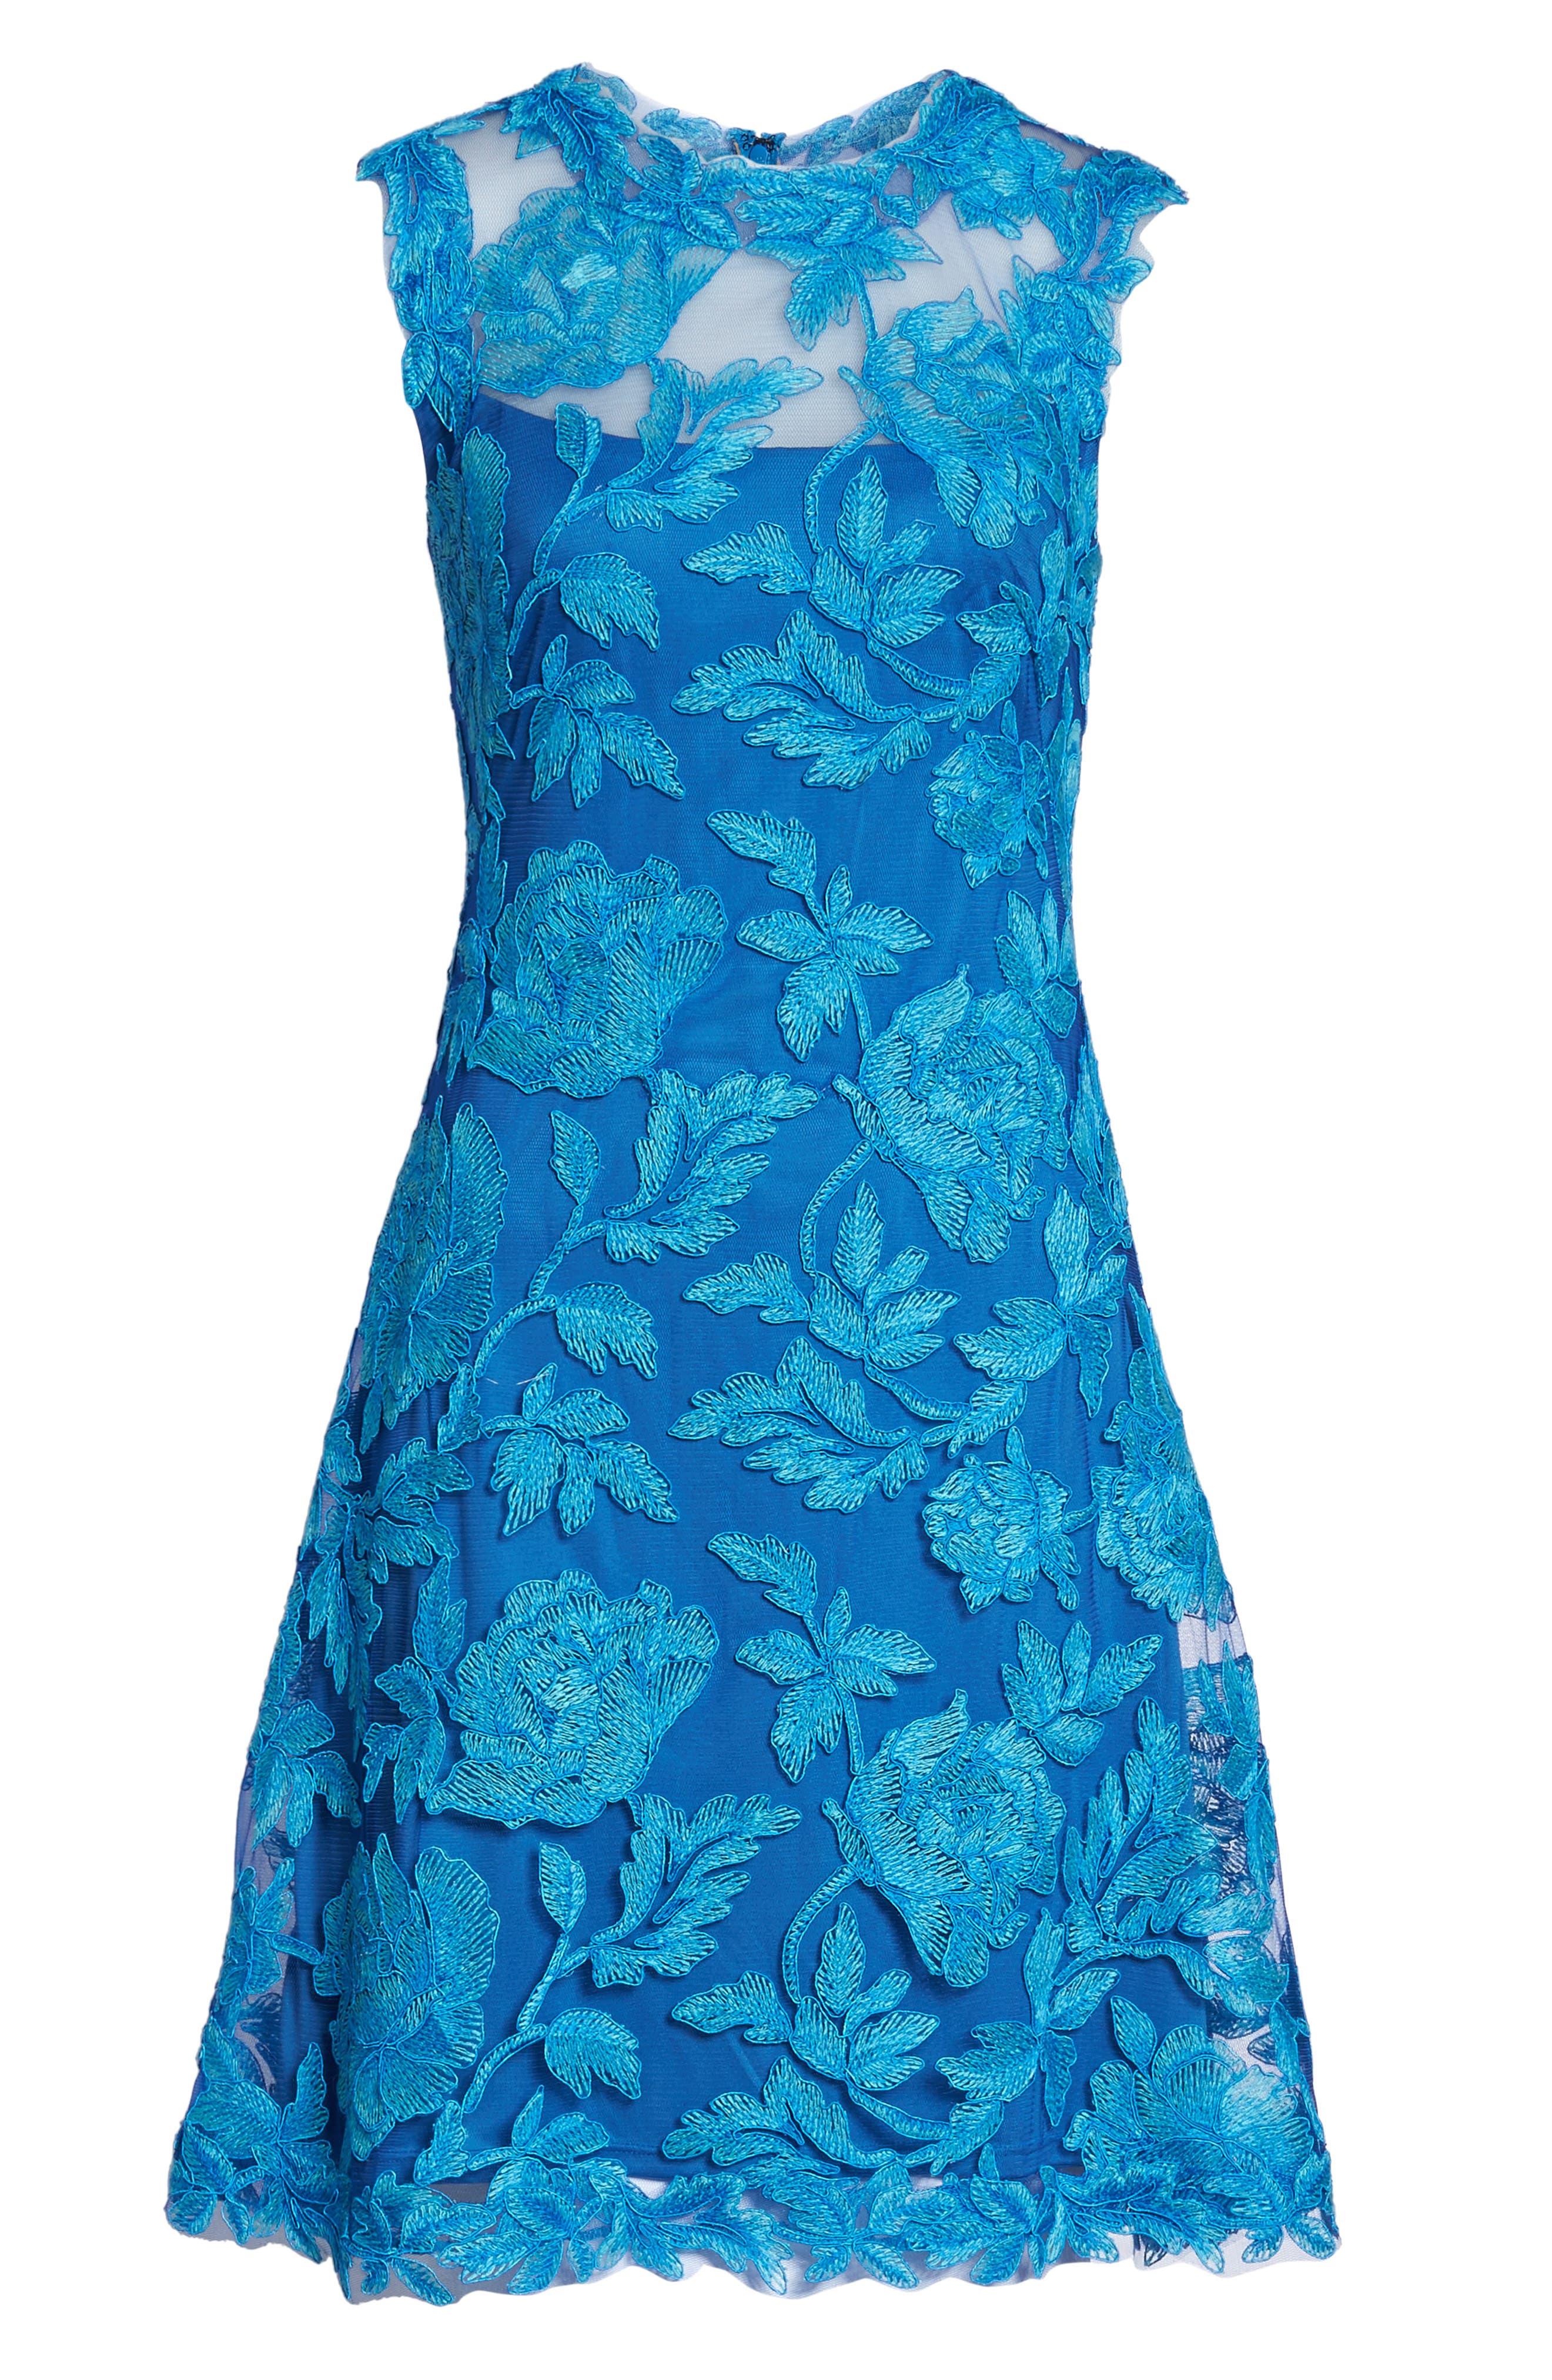 Noelle Floral Fit & Flare Dress,                             Alternate thumbnail 6, color,                             Blue Topaz